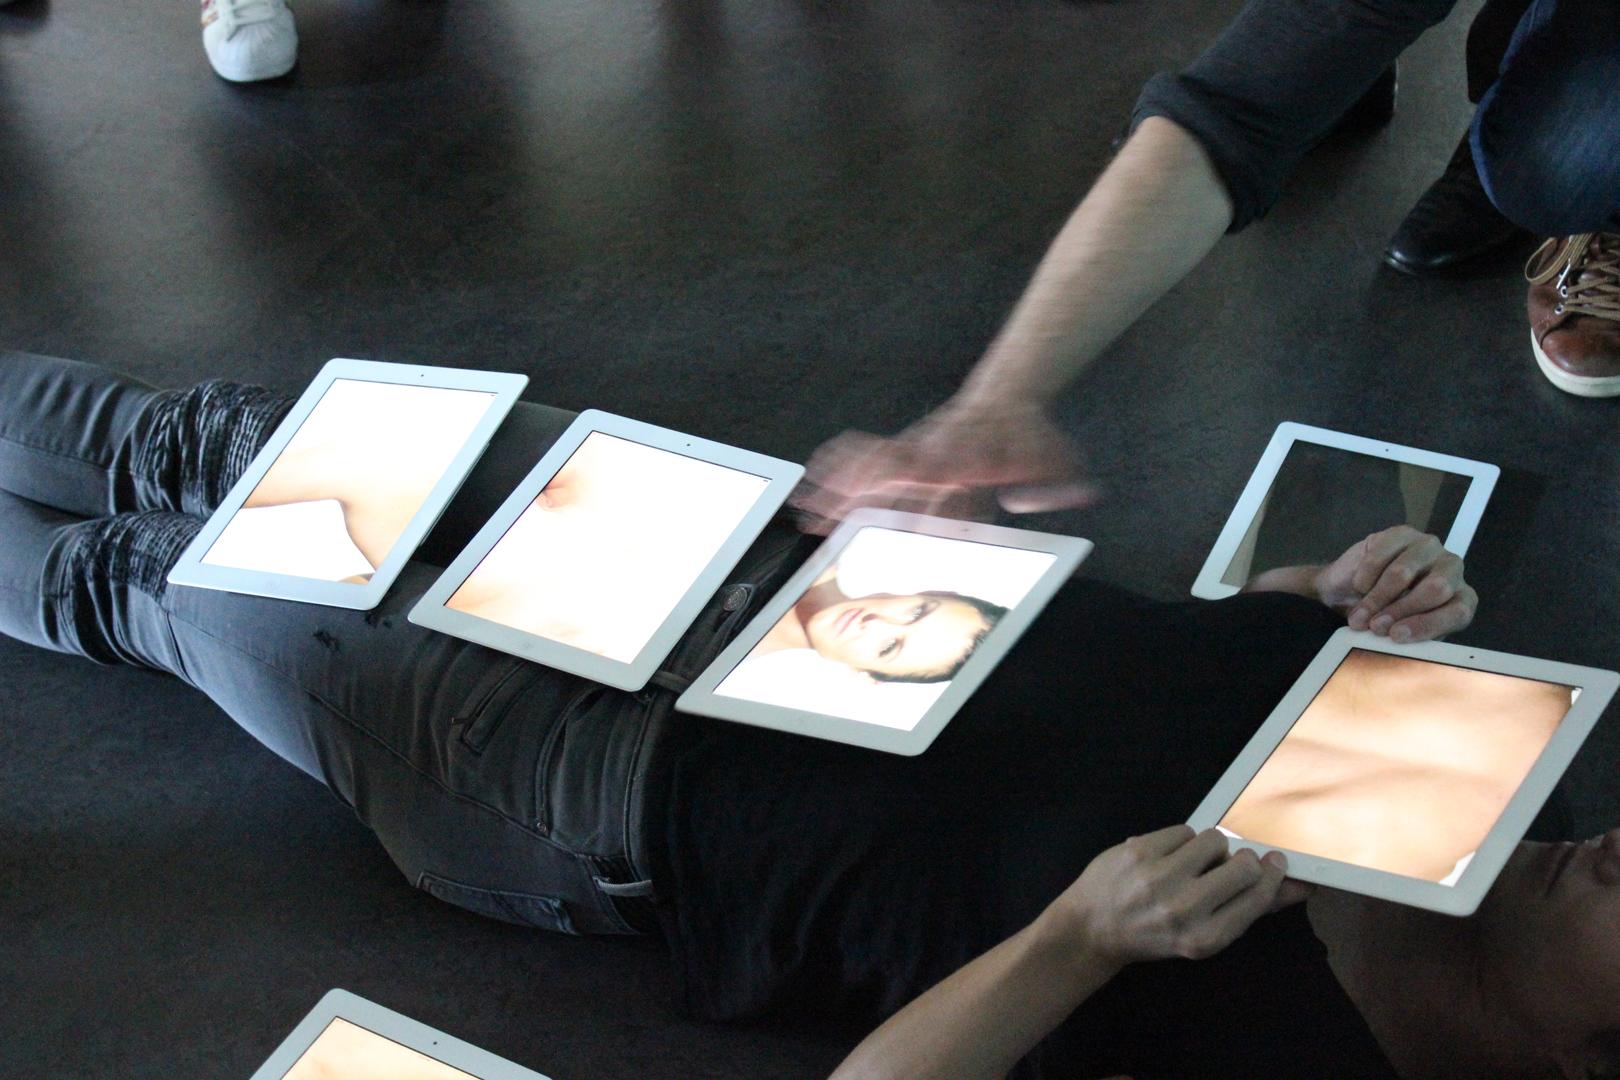 ©2015, Paul Wong and Patrick Daggitt, MIMMiC (Mobile Interactive Modular Multi-screen iPad Canvas)